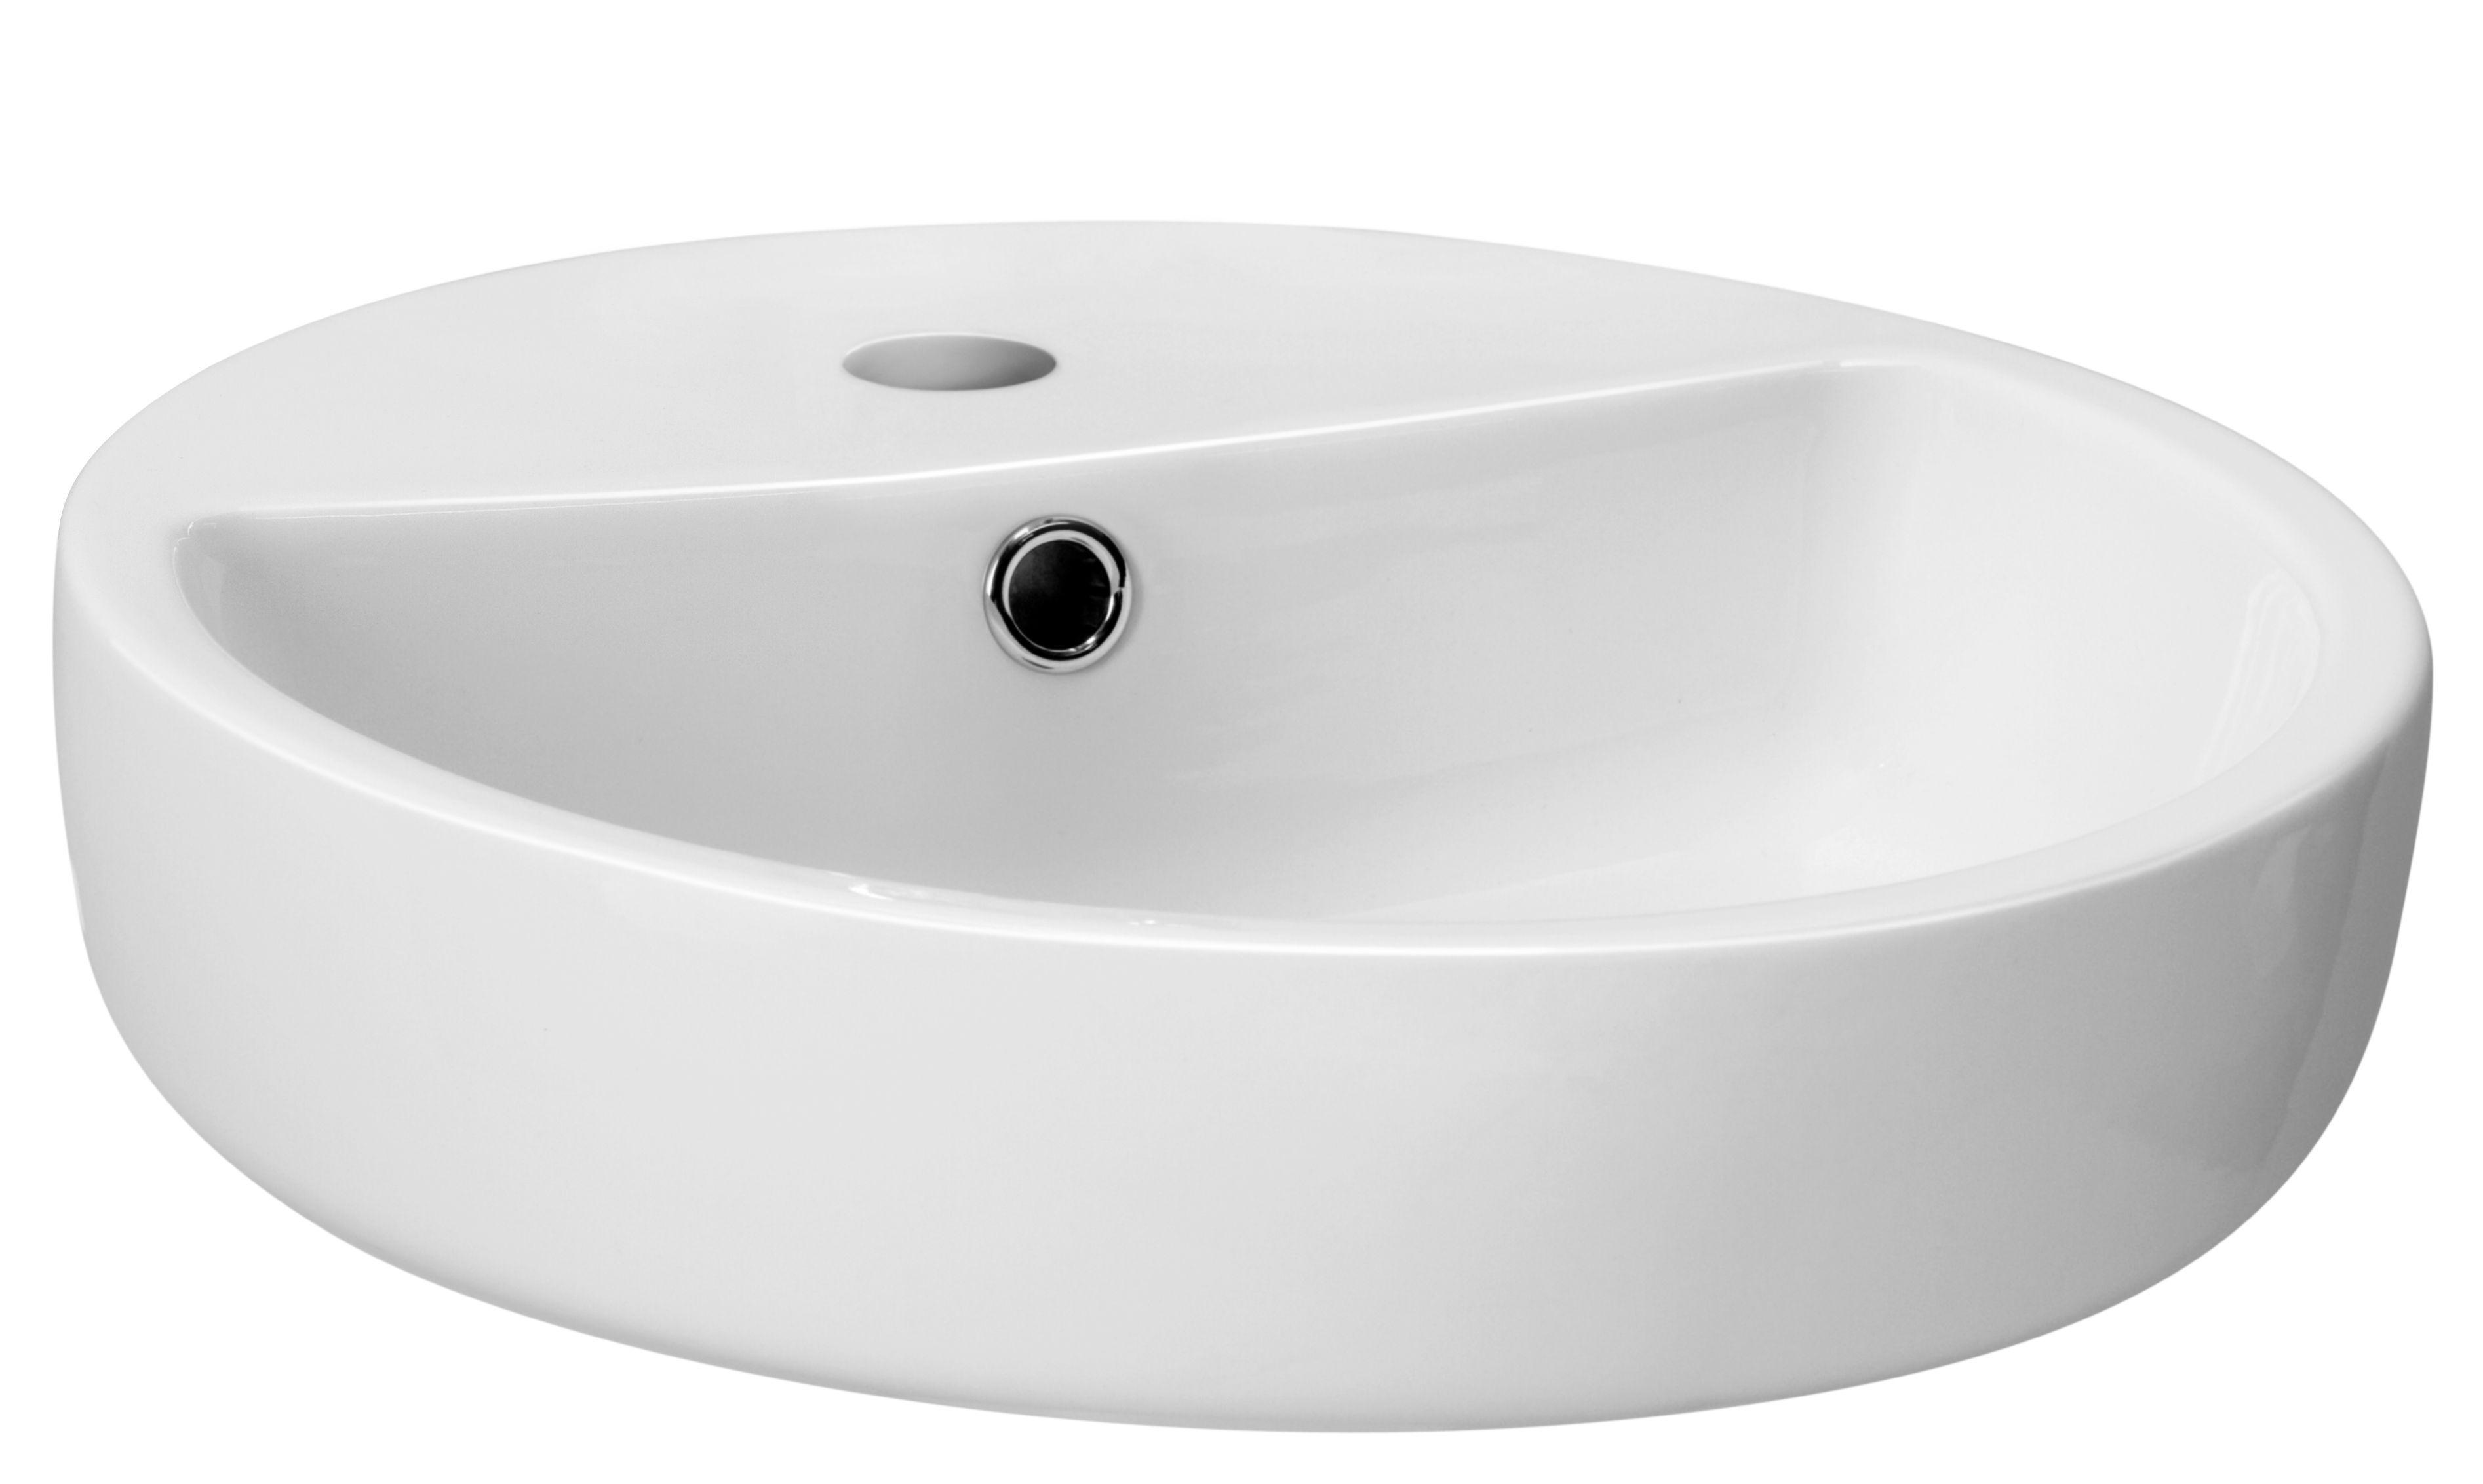 Bathroom Sinks B&Q Ireland nicolina white countertop basin | departments | diy at b&q